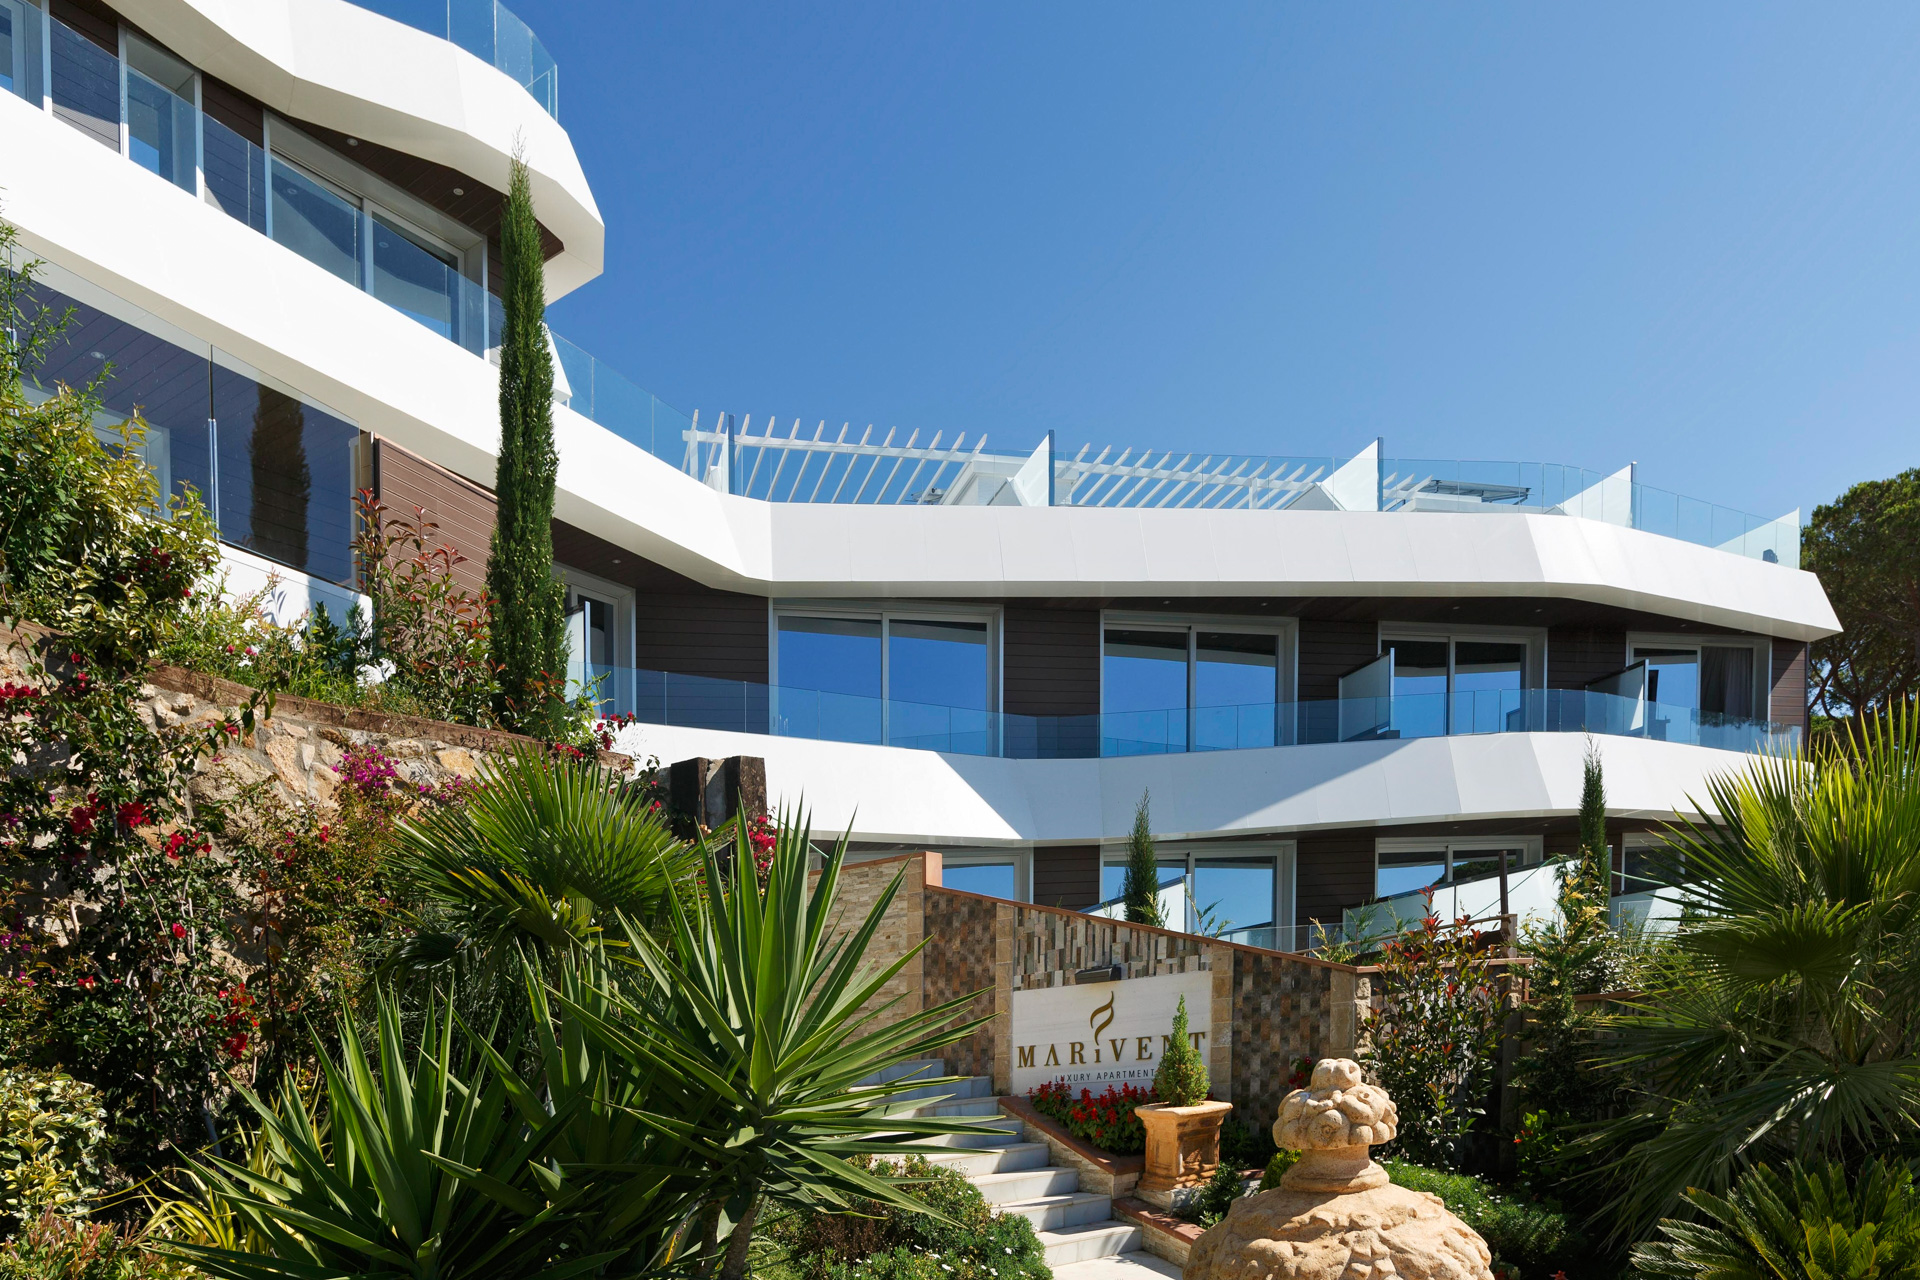 Marivent Luxury Apartments, Girona